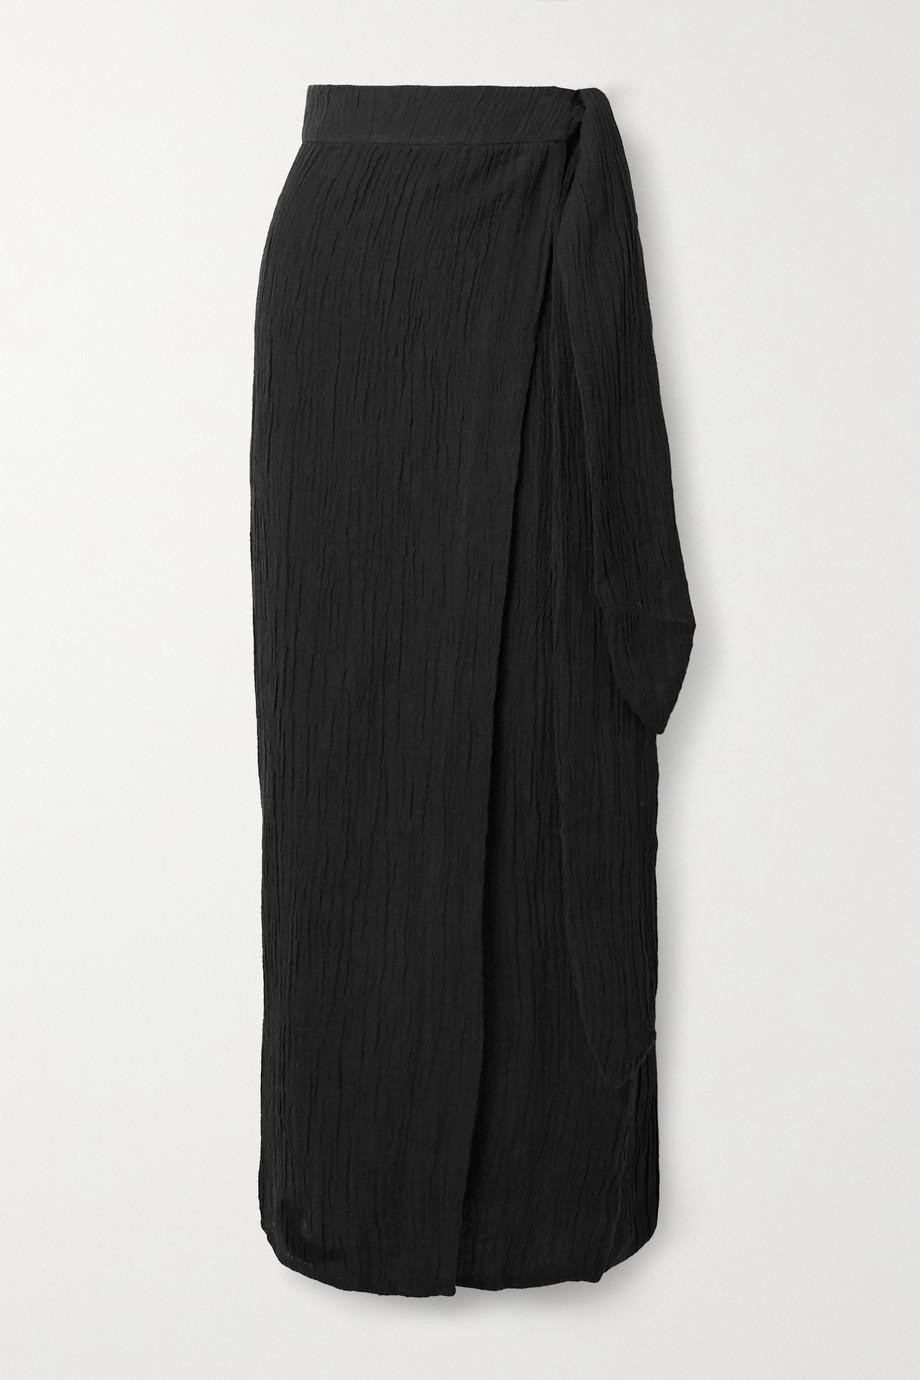 Mara Hoffman + NET SUSTAIN Thiago crinkled organic linen and cotton-blend wrap skirt